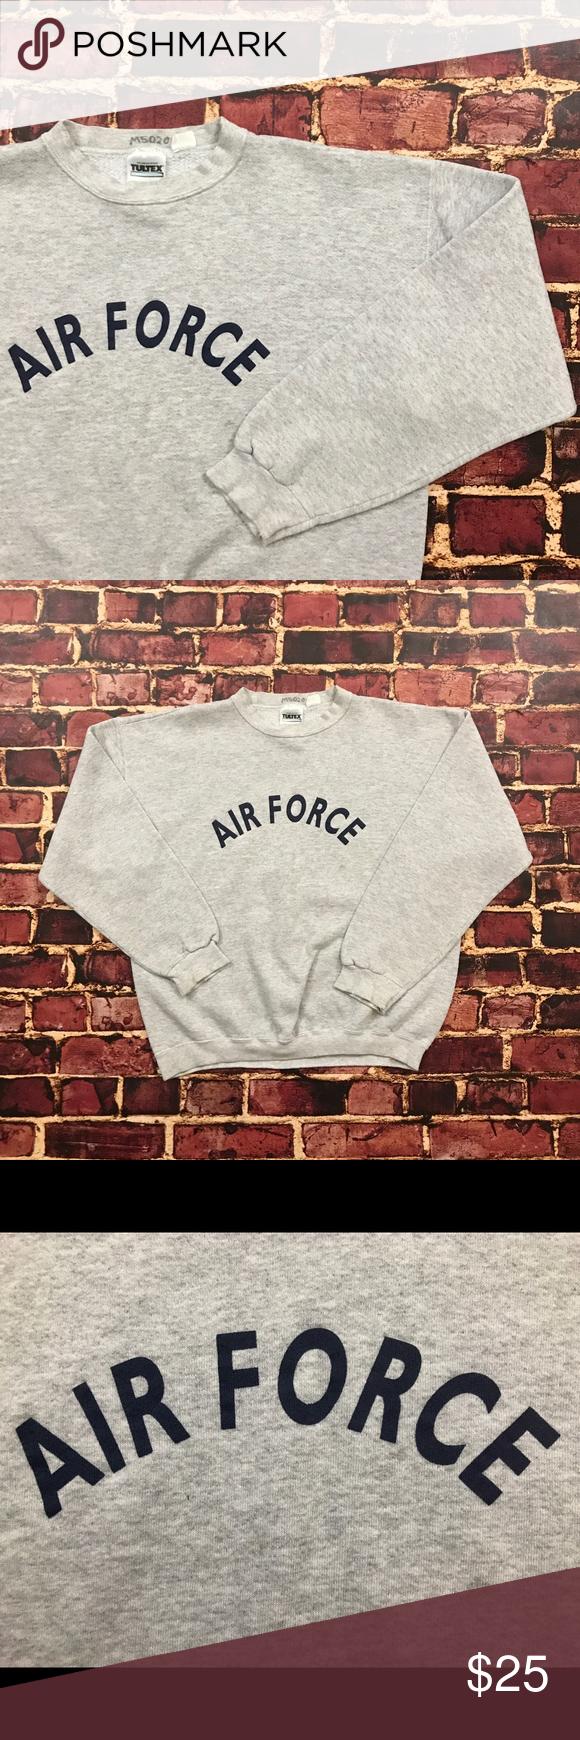 Vintage Air Force Sweatshirt Usaf Crewneck Gray Vintage Air Force Sweatshirt Pullover Crewneck Mens Large Air Force Sweatshirt Pullover Sweatshirts Sweatshirts [ 1740 x 580 Pixel ]